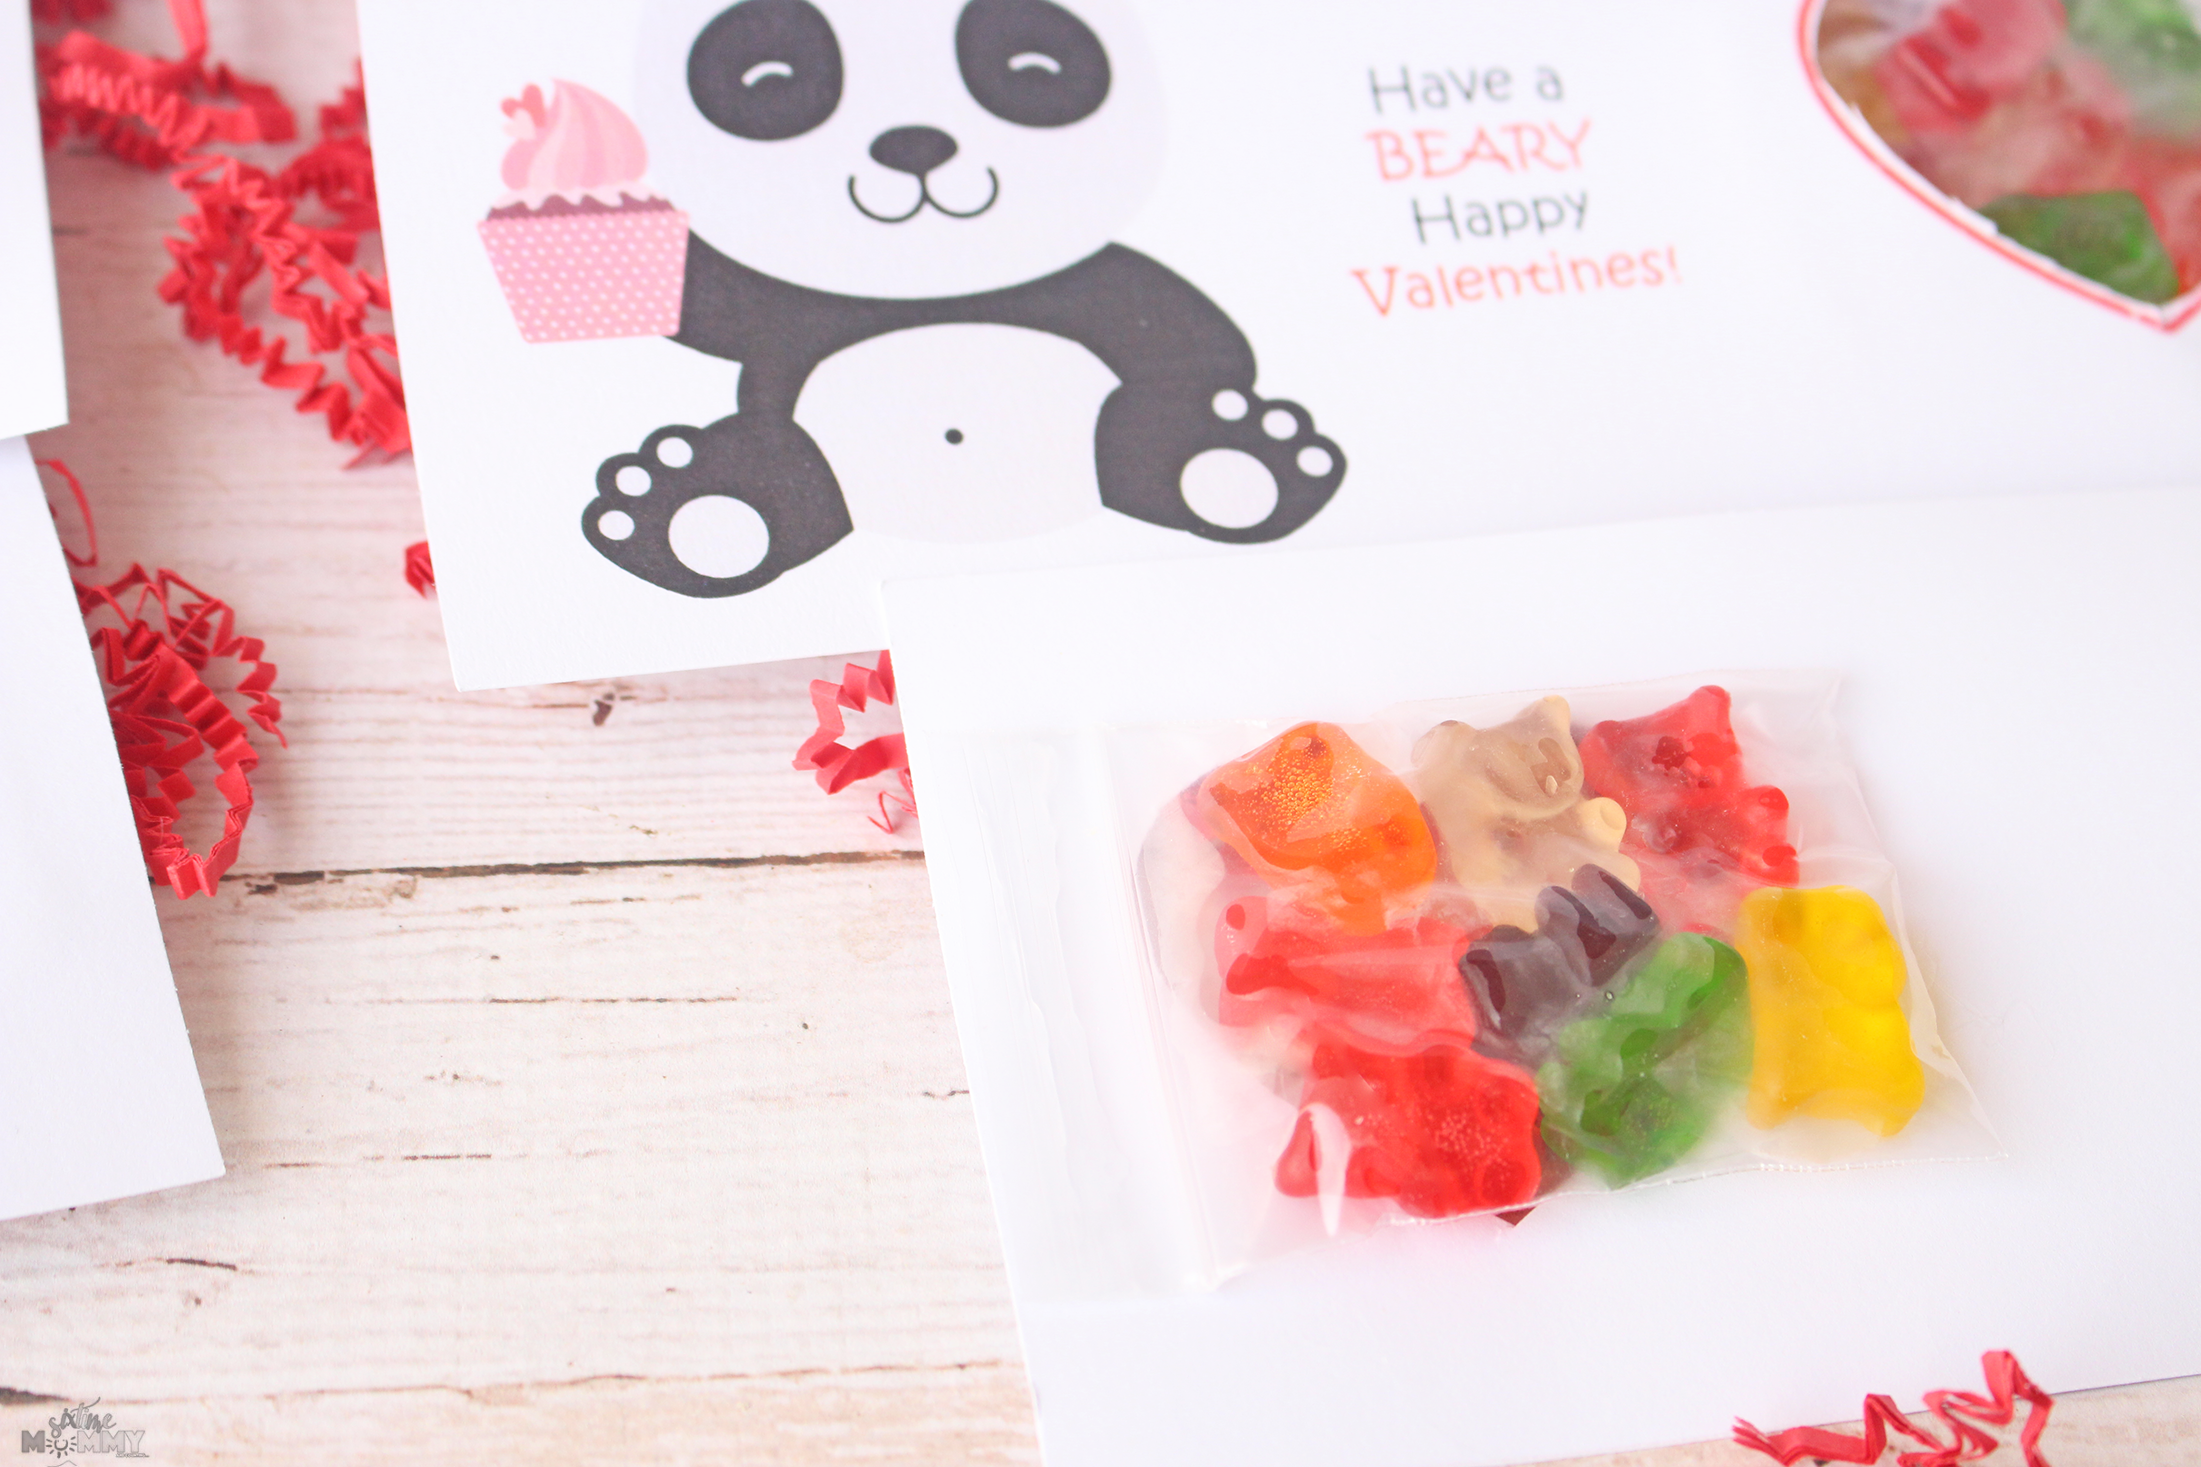 DIY Valentine's Gummy Bear Treats With FREE Printable - sixtimemommy.com